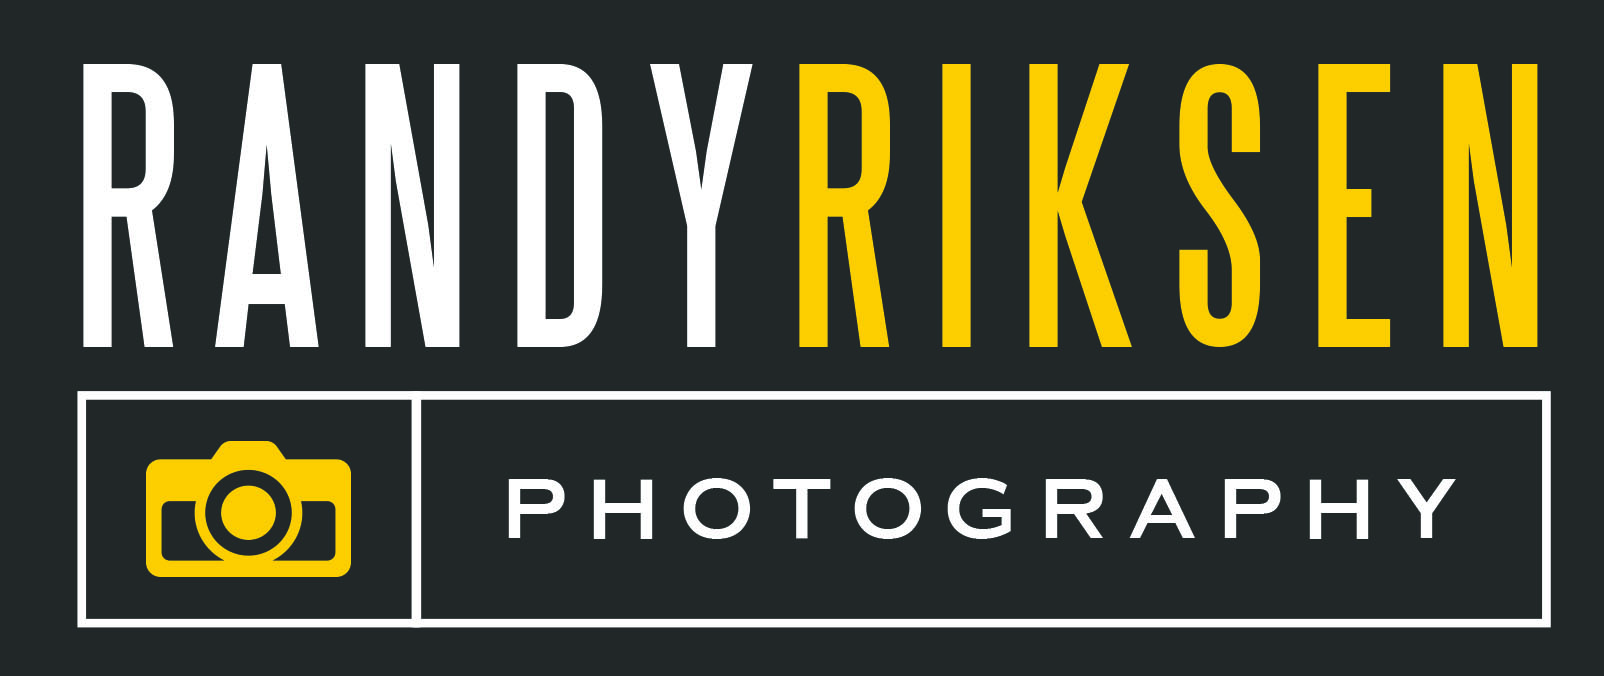 Randy Riksen Photography